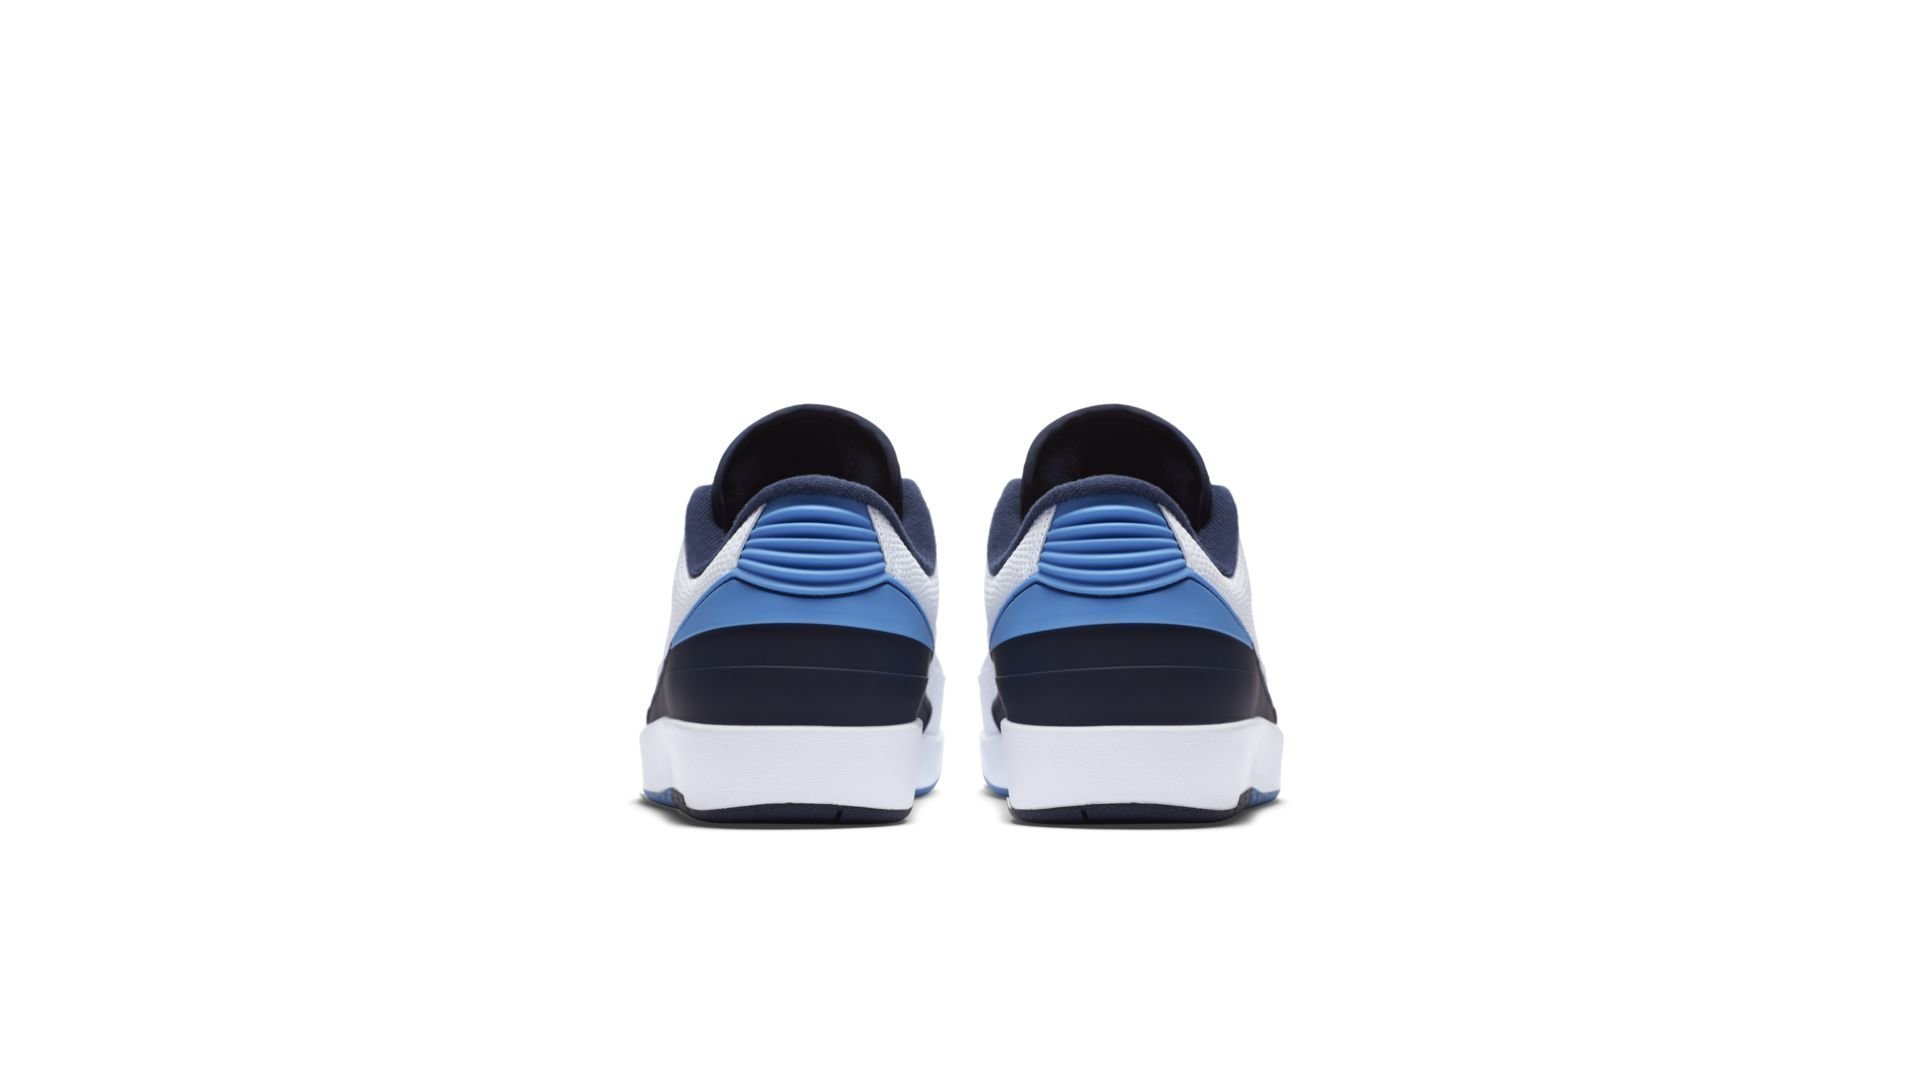 Jordan 2 Retro Low University Blue (2016) (832819-107)